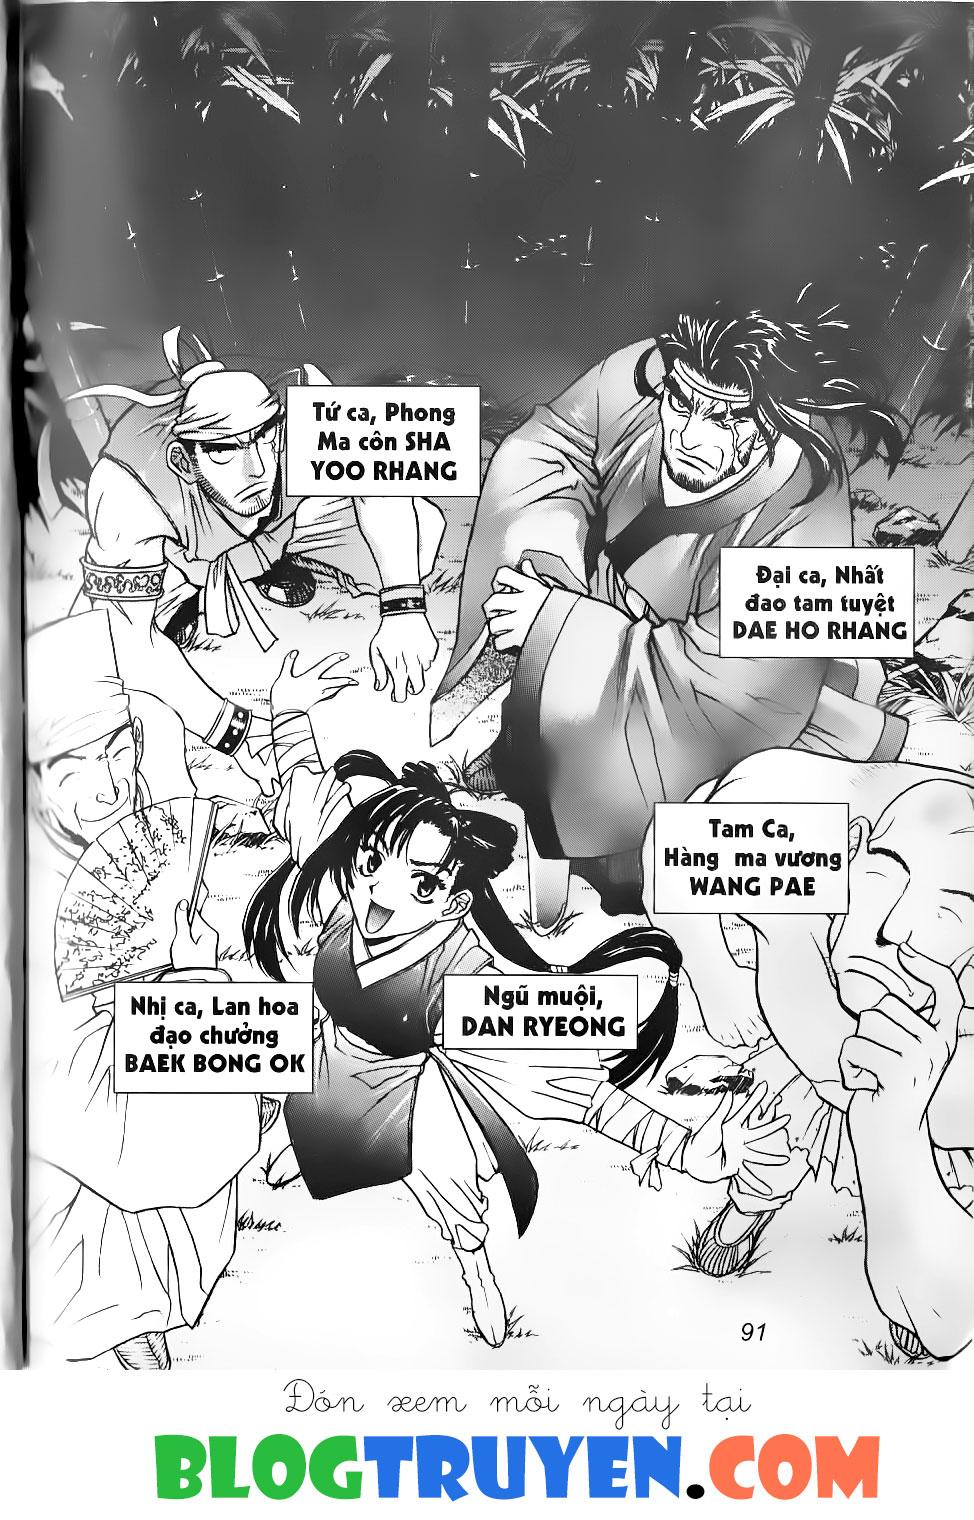 Thiên Lang Liệt Truyện Scan Chap 6 - Truyen.Chap.VN